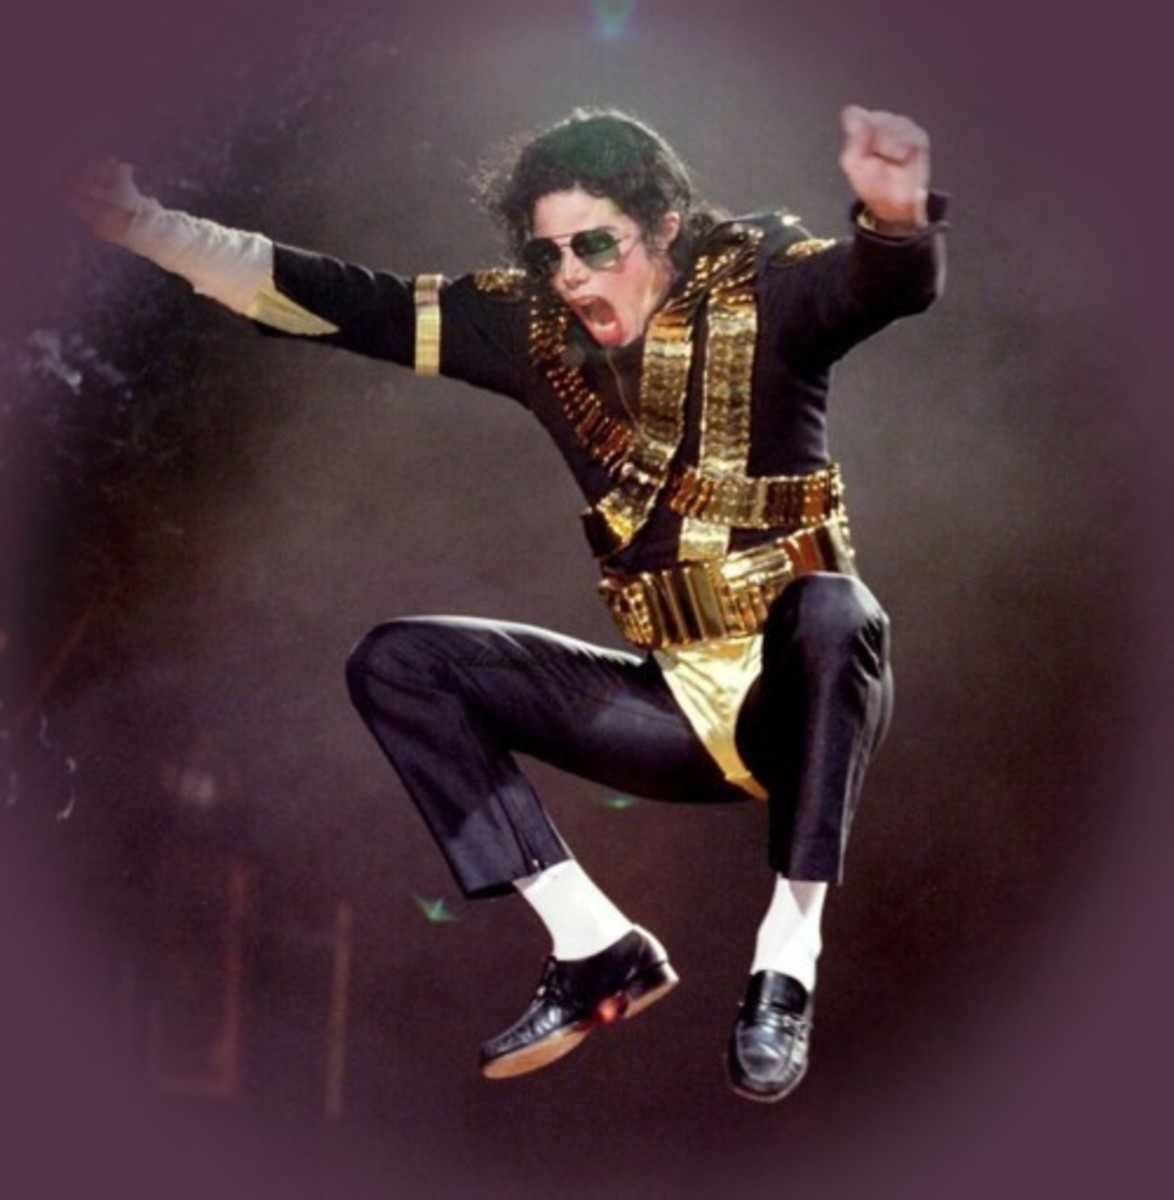 MJ live in 1993, here in full Dangerous-era costume.